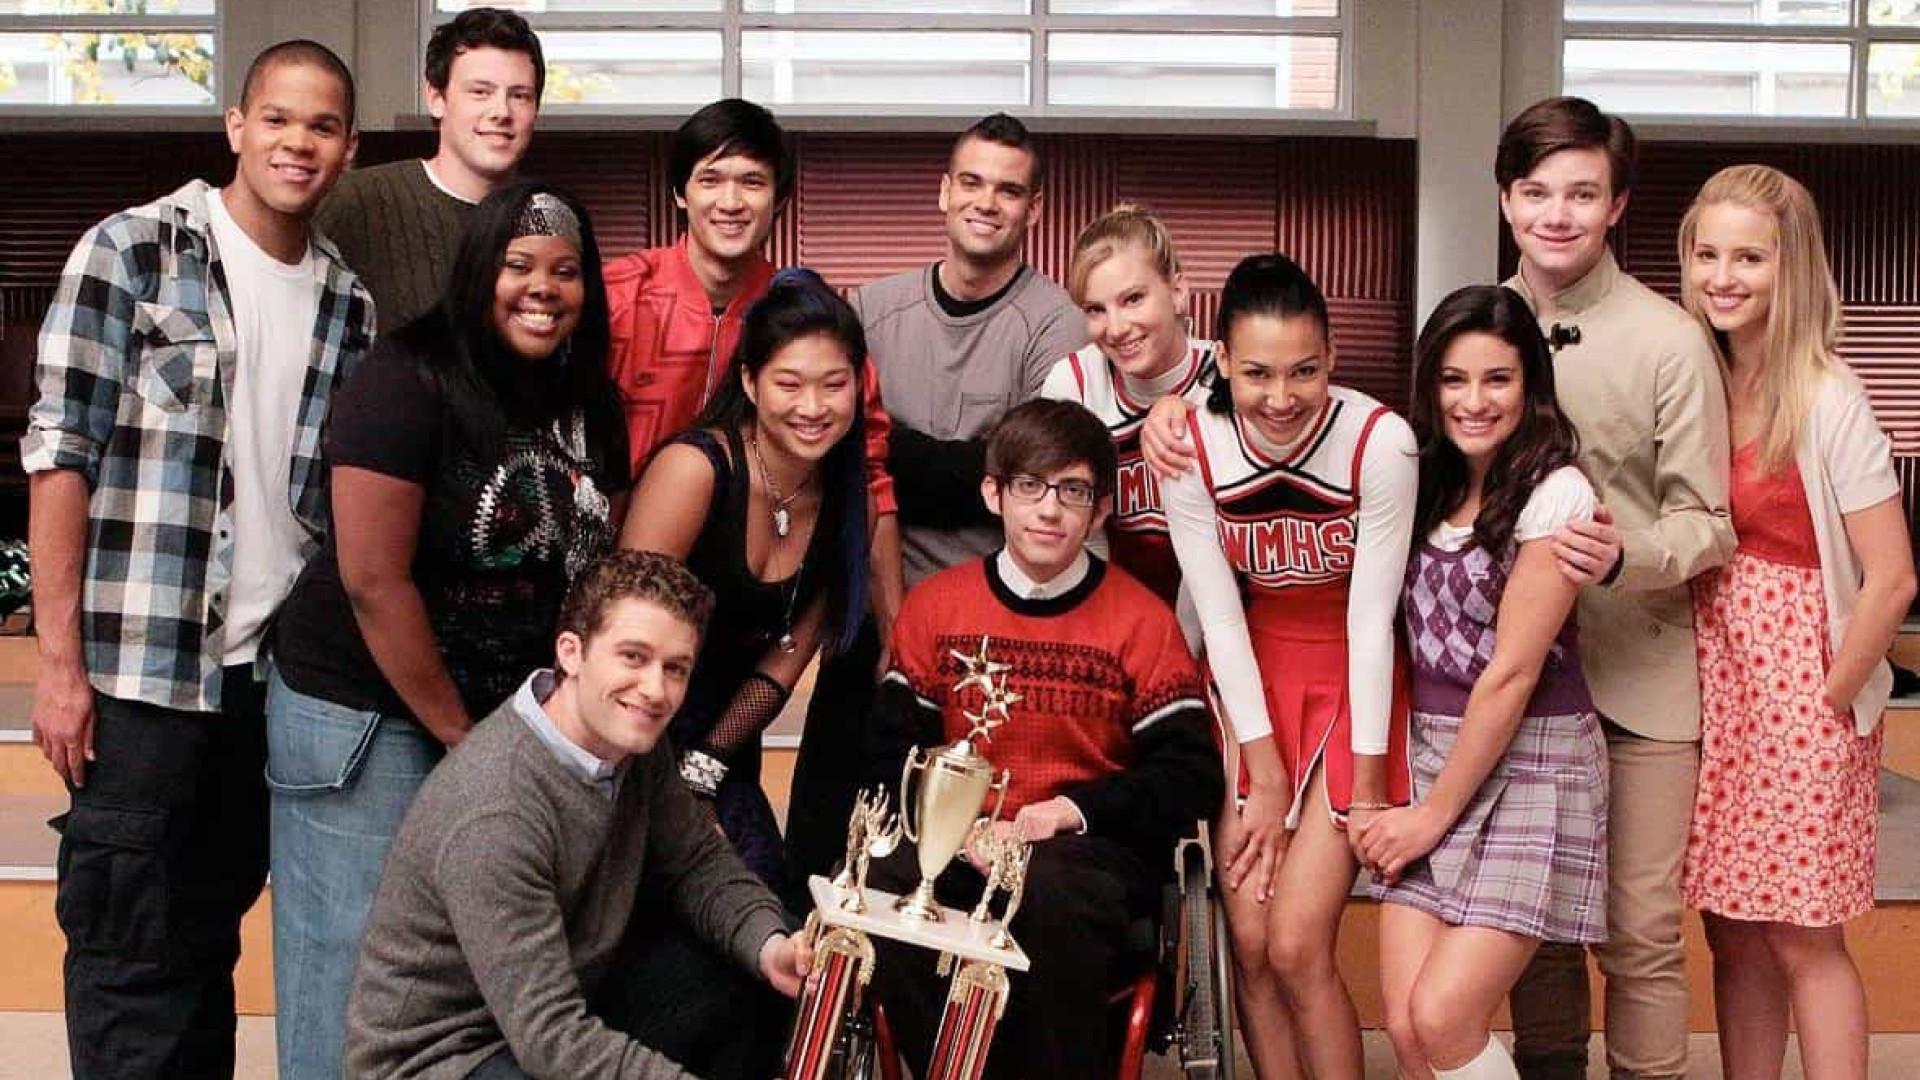 Elenco de 'Glee' lamenta morte de Naya Rivera: 'Deus te chamou'